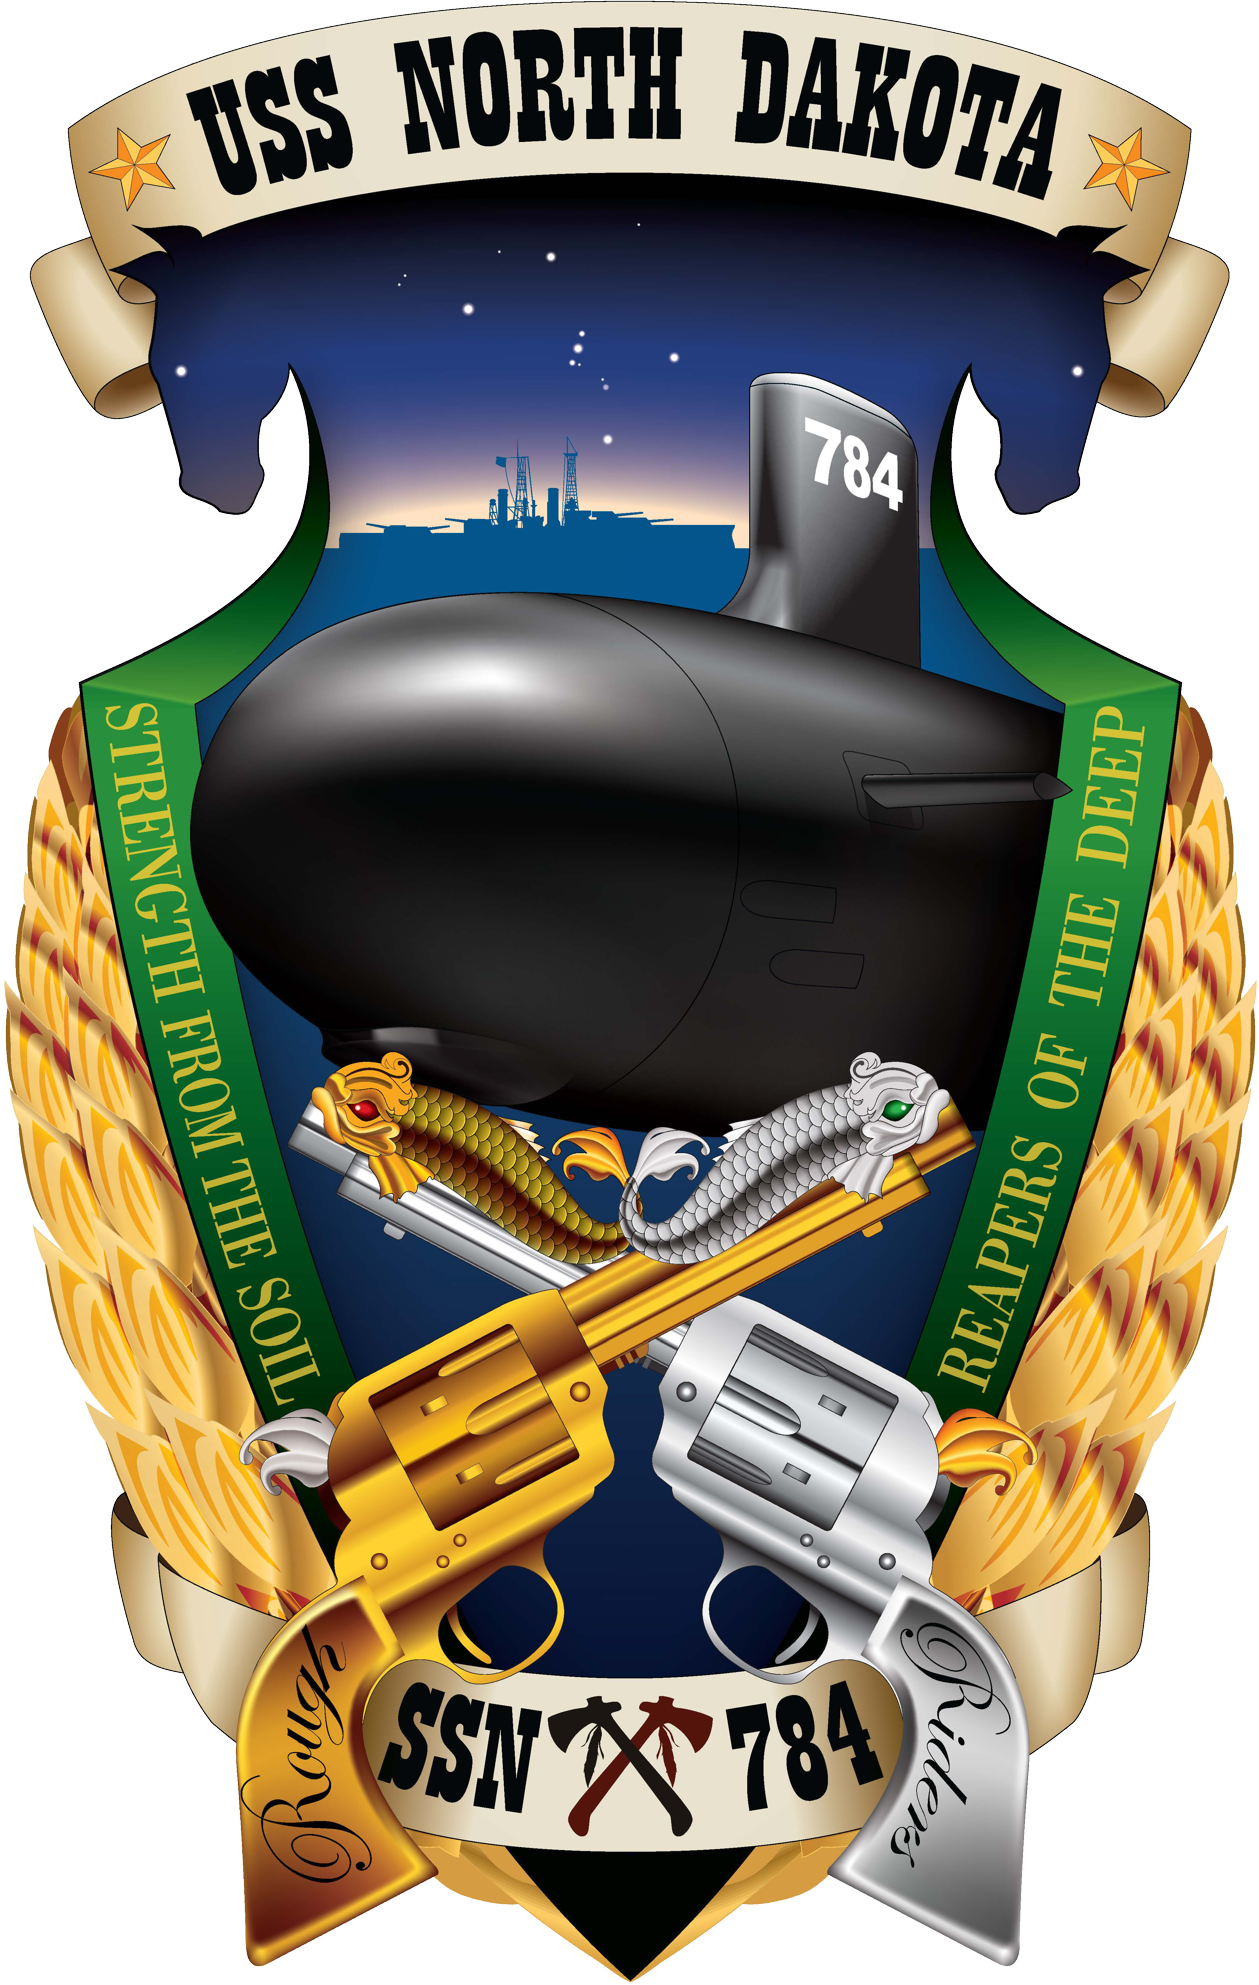 File:USS North Dakota (SSN-784) crest 2013.png